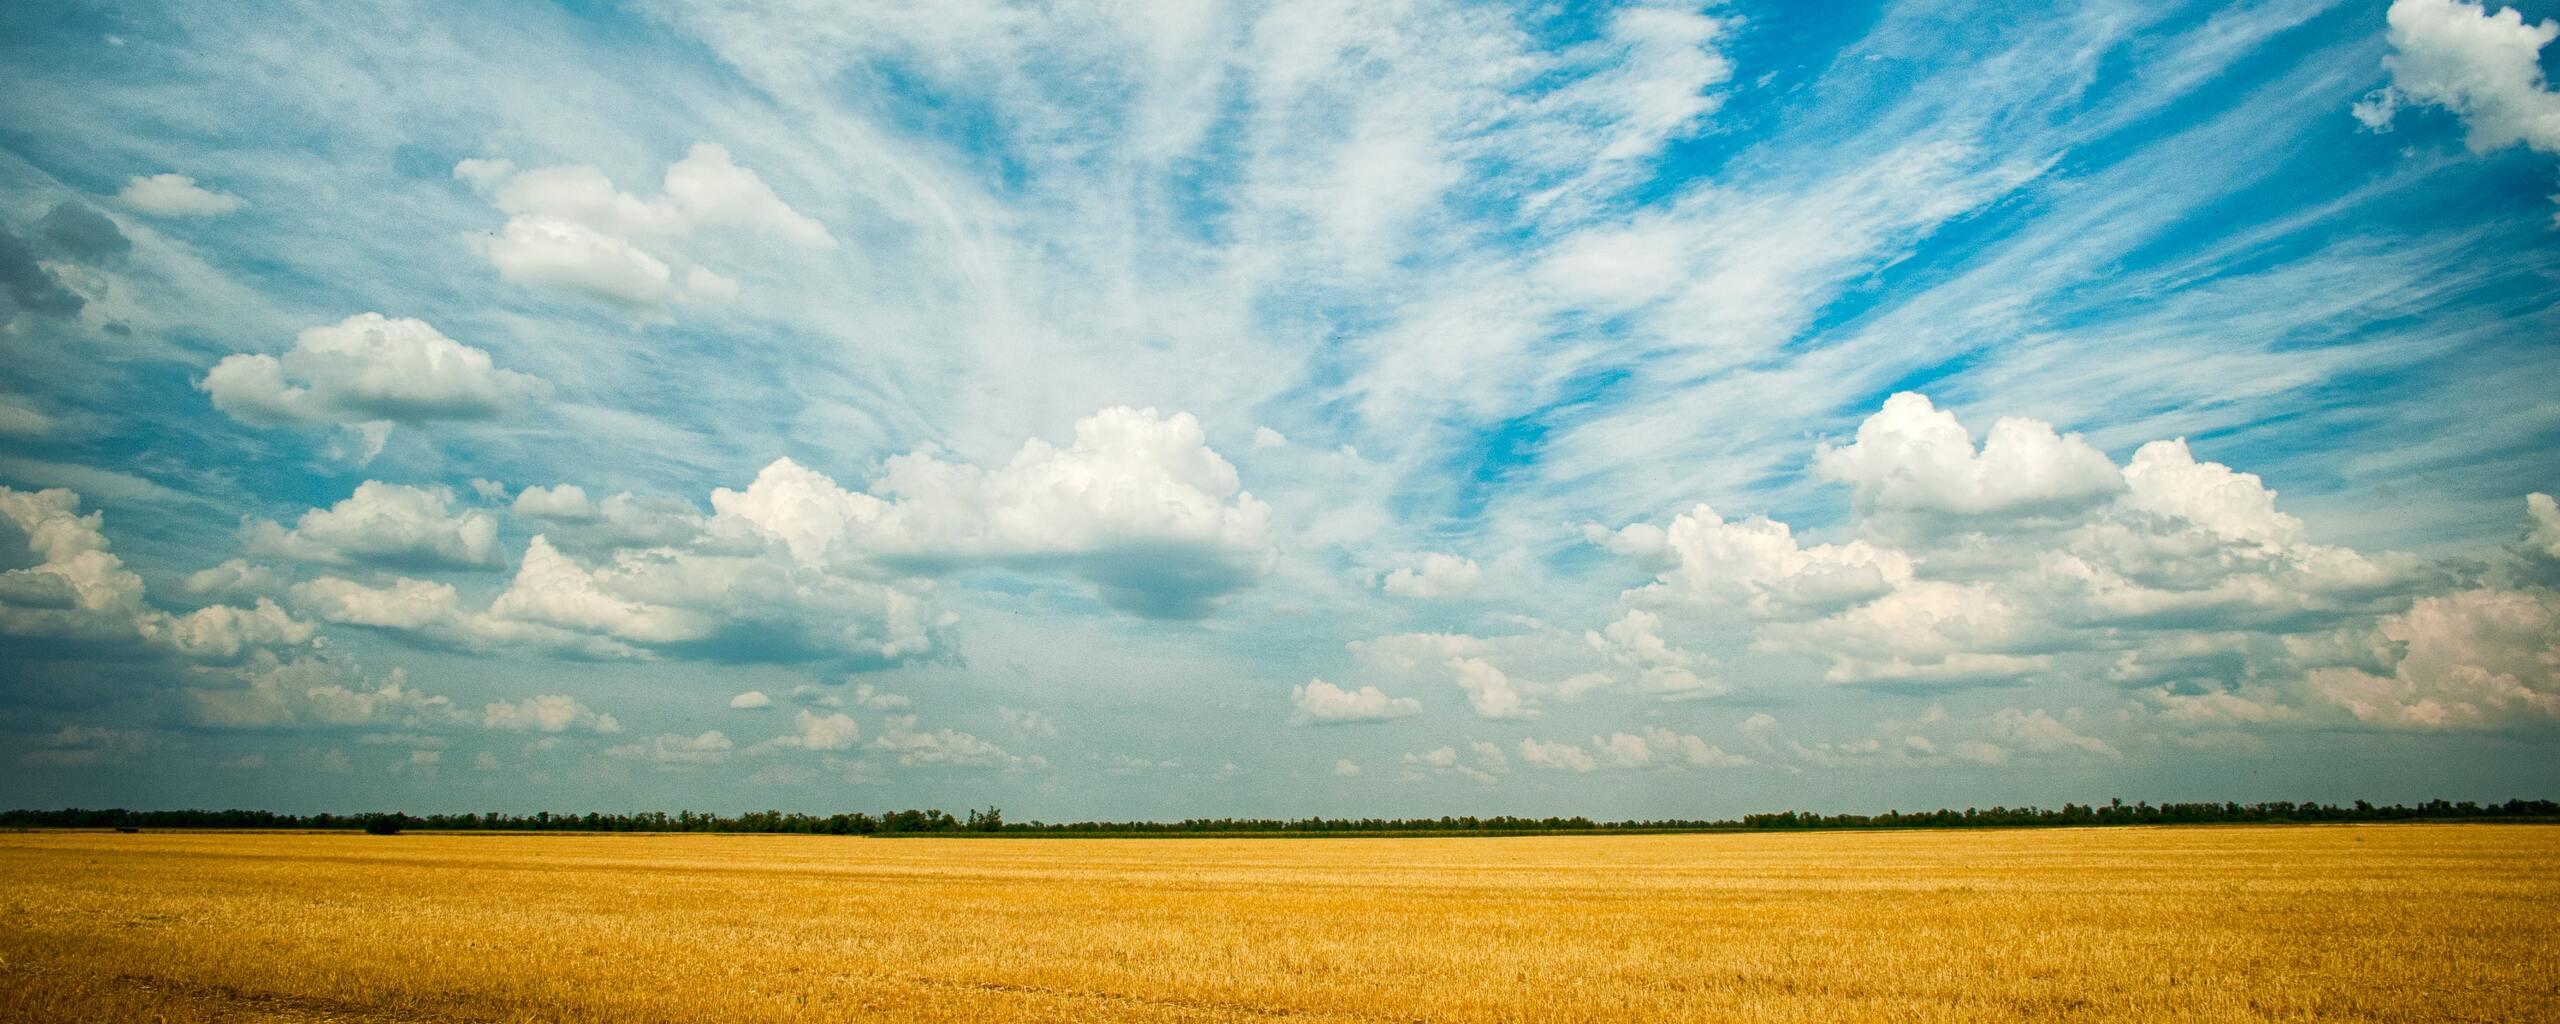 yellow-grass-field-4k-7n.jpg